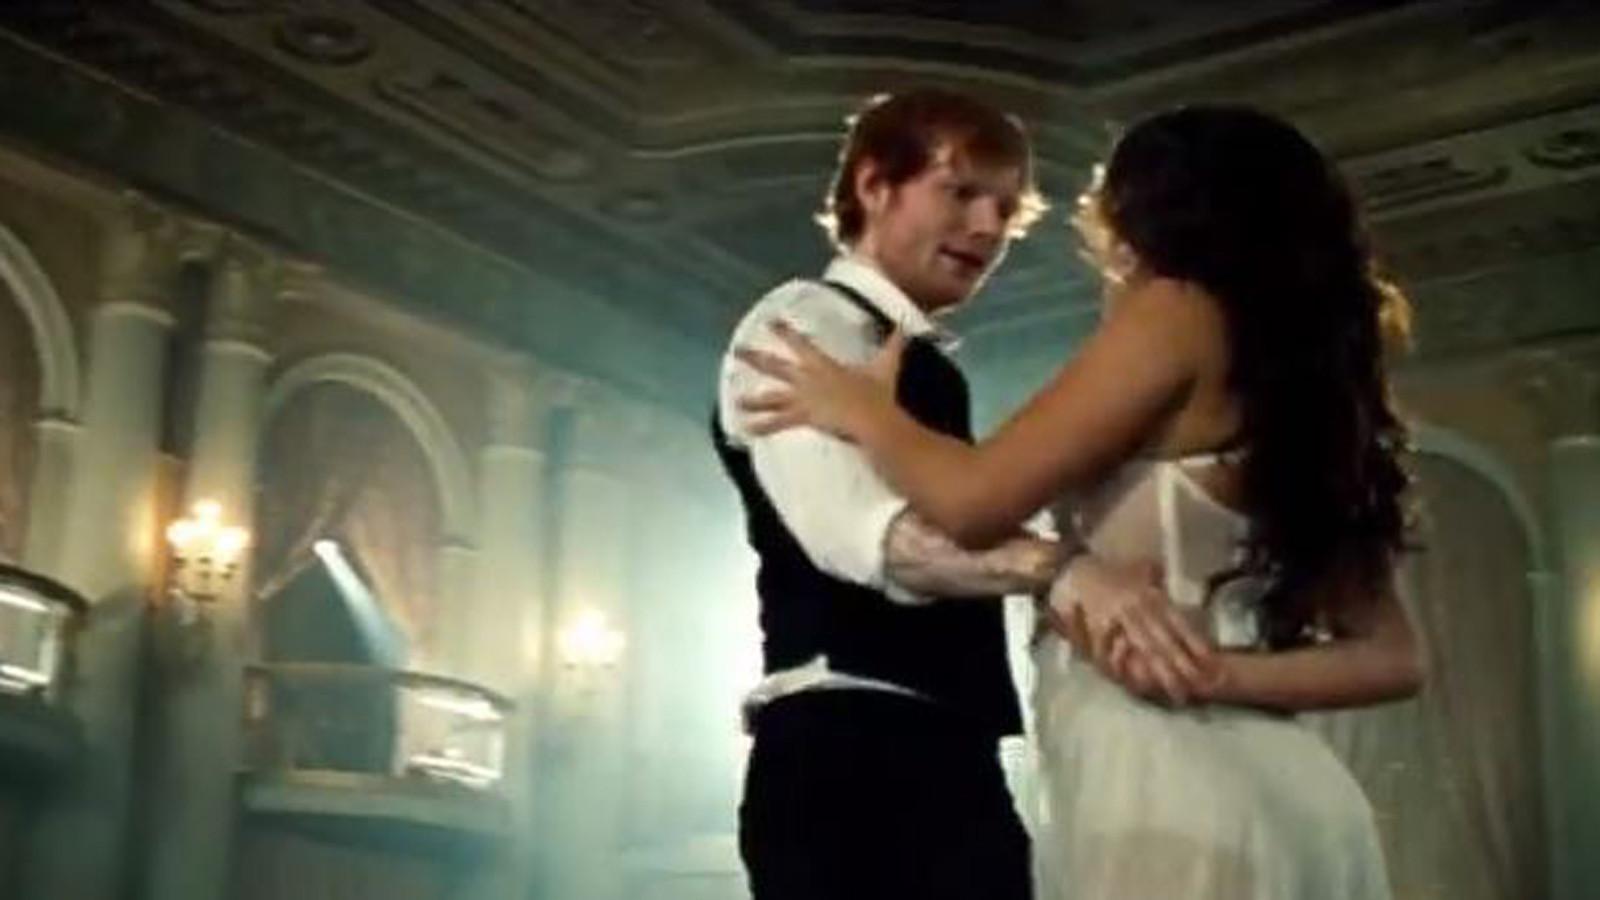 Ed Sheeran | 'Thinking Out Loud' - LA Times